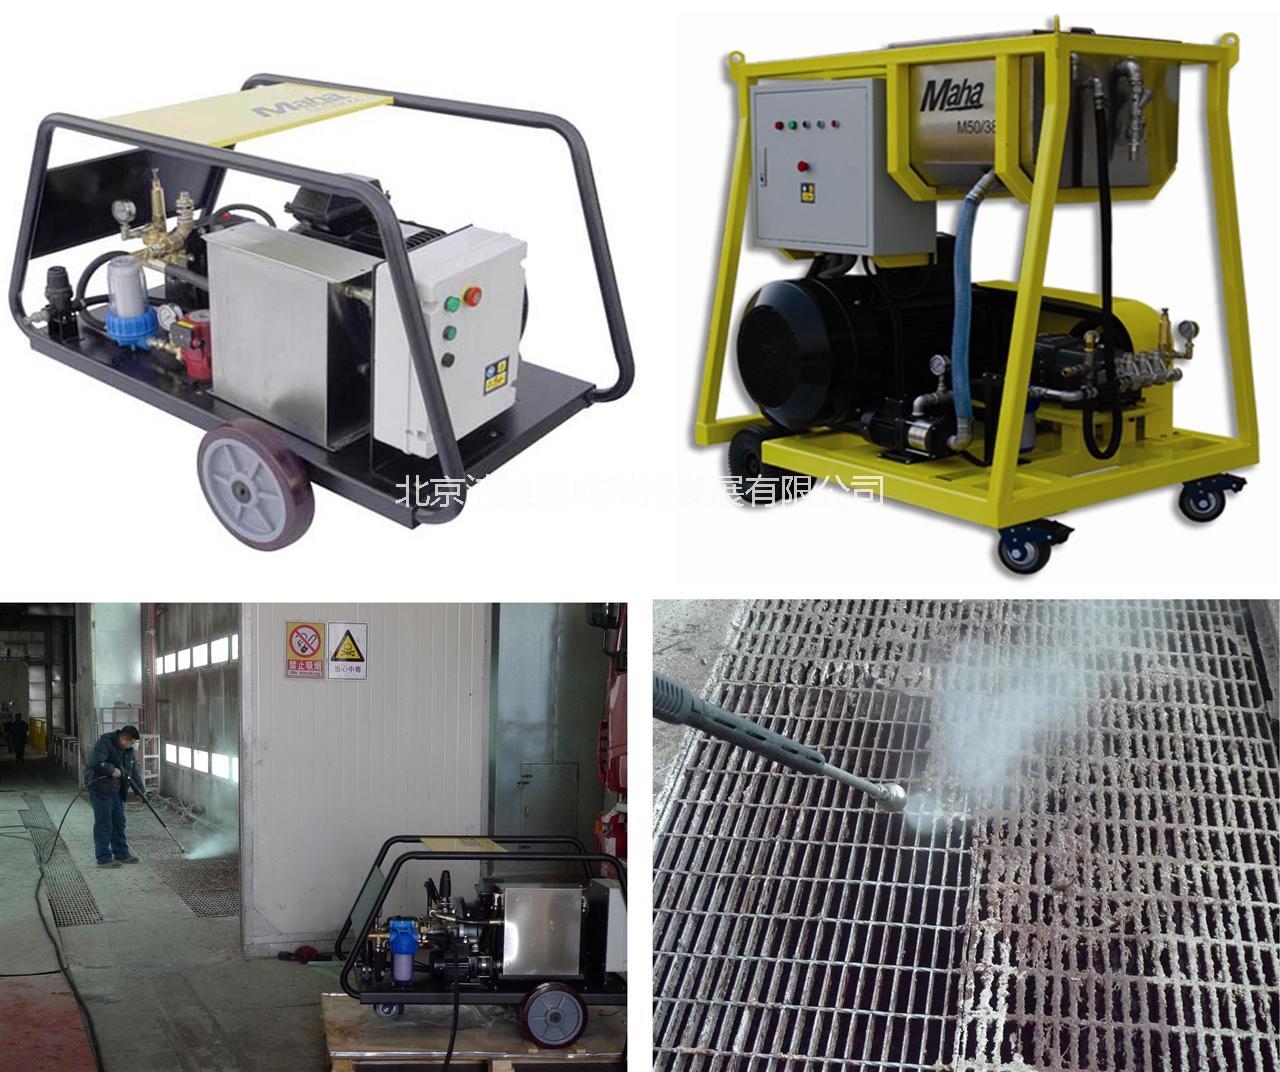 MAHA MH28/18维修德国进口品牌 热水高压清洗机,专业维修高压清洗机